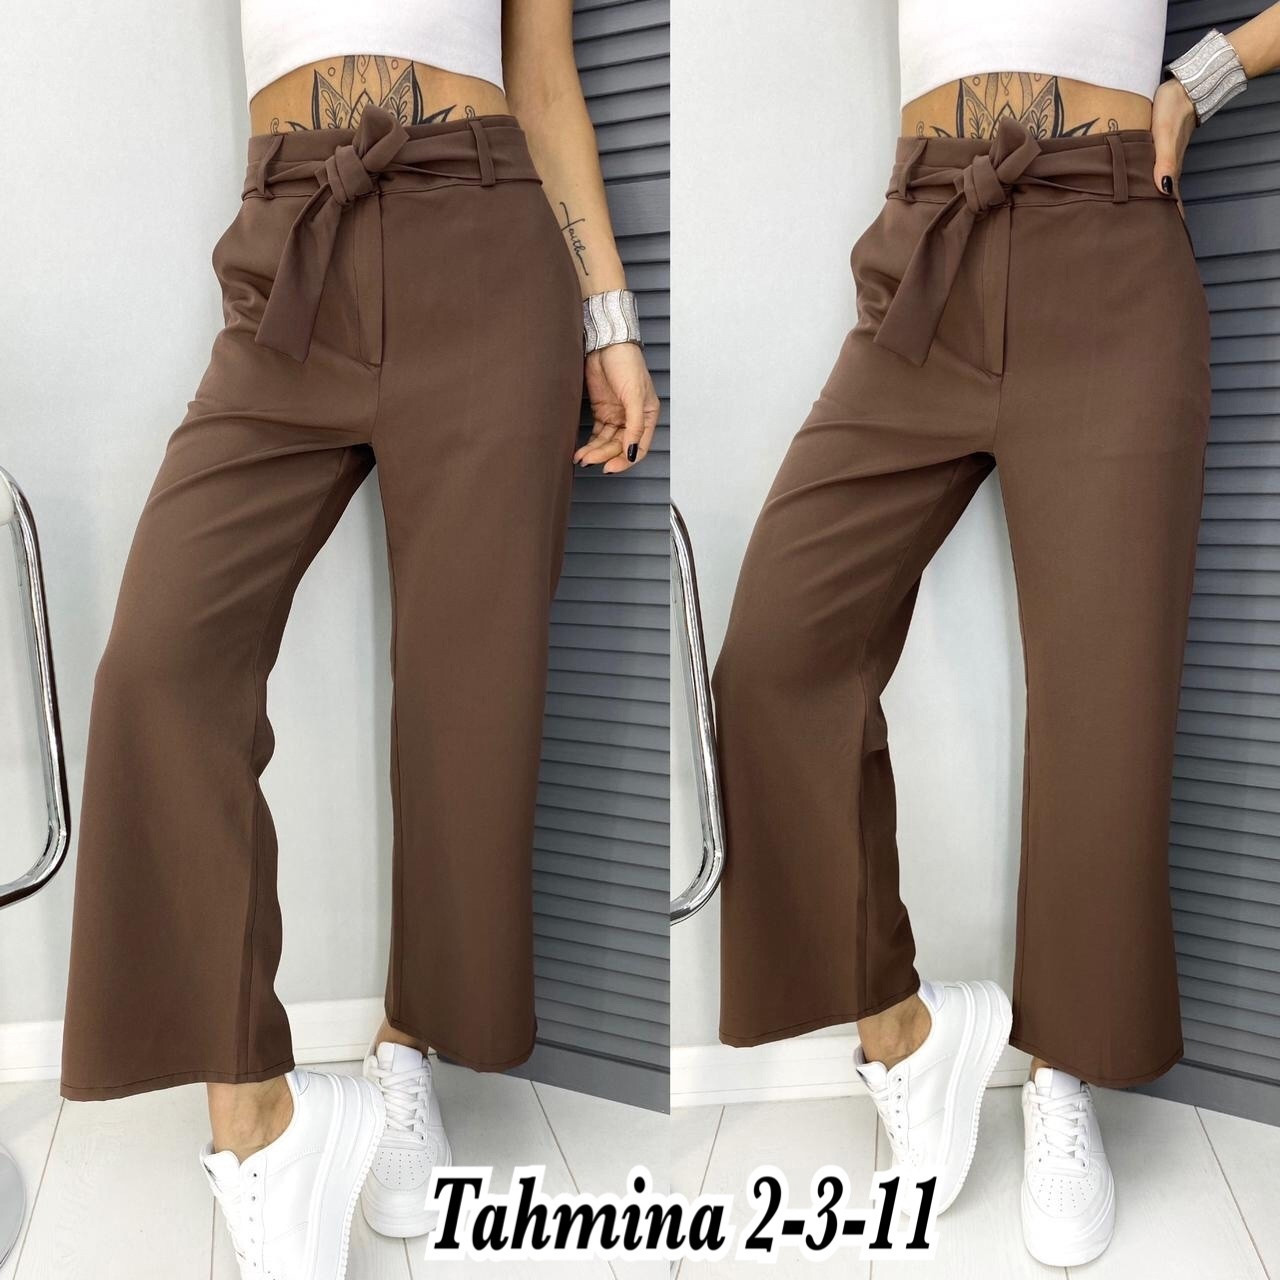 Женские брюки, костюмка класса люкс, р-р 42-44; 44-46 (мокко)